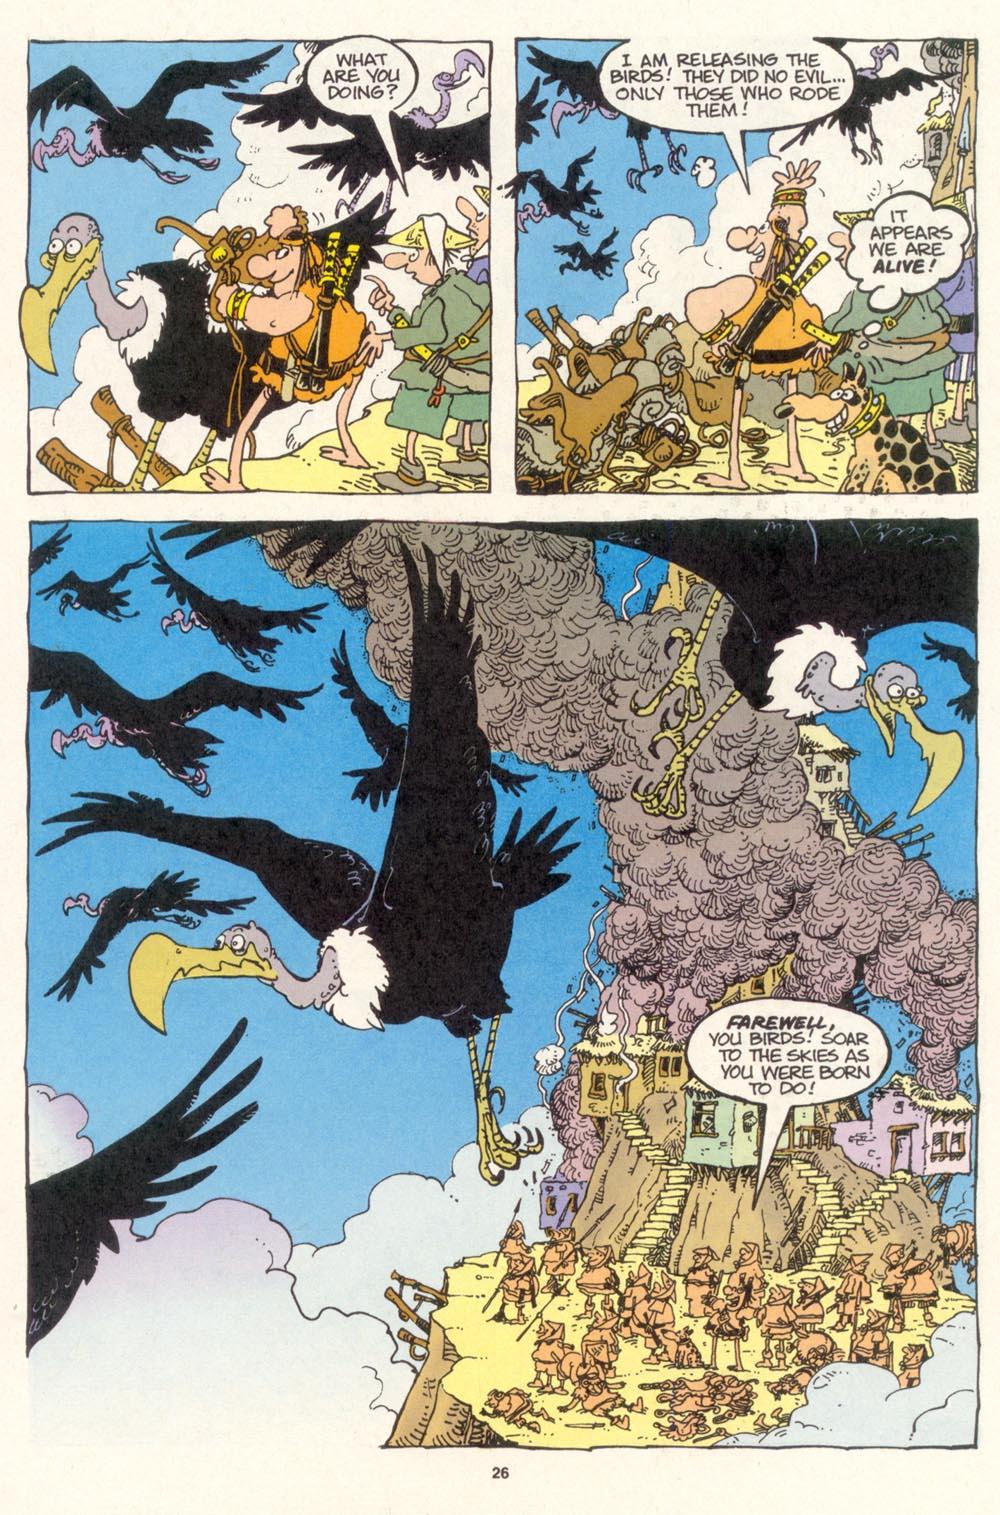 Read online Sergio Aragonés Groo the Wanderer comic -  Issue #115 - 28